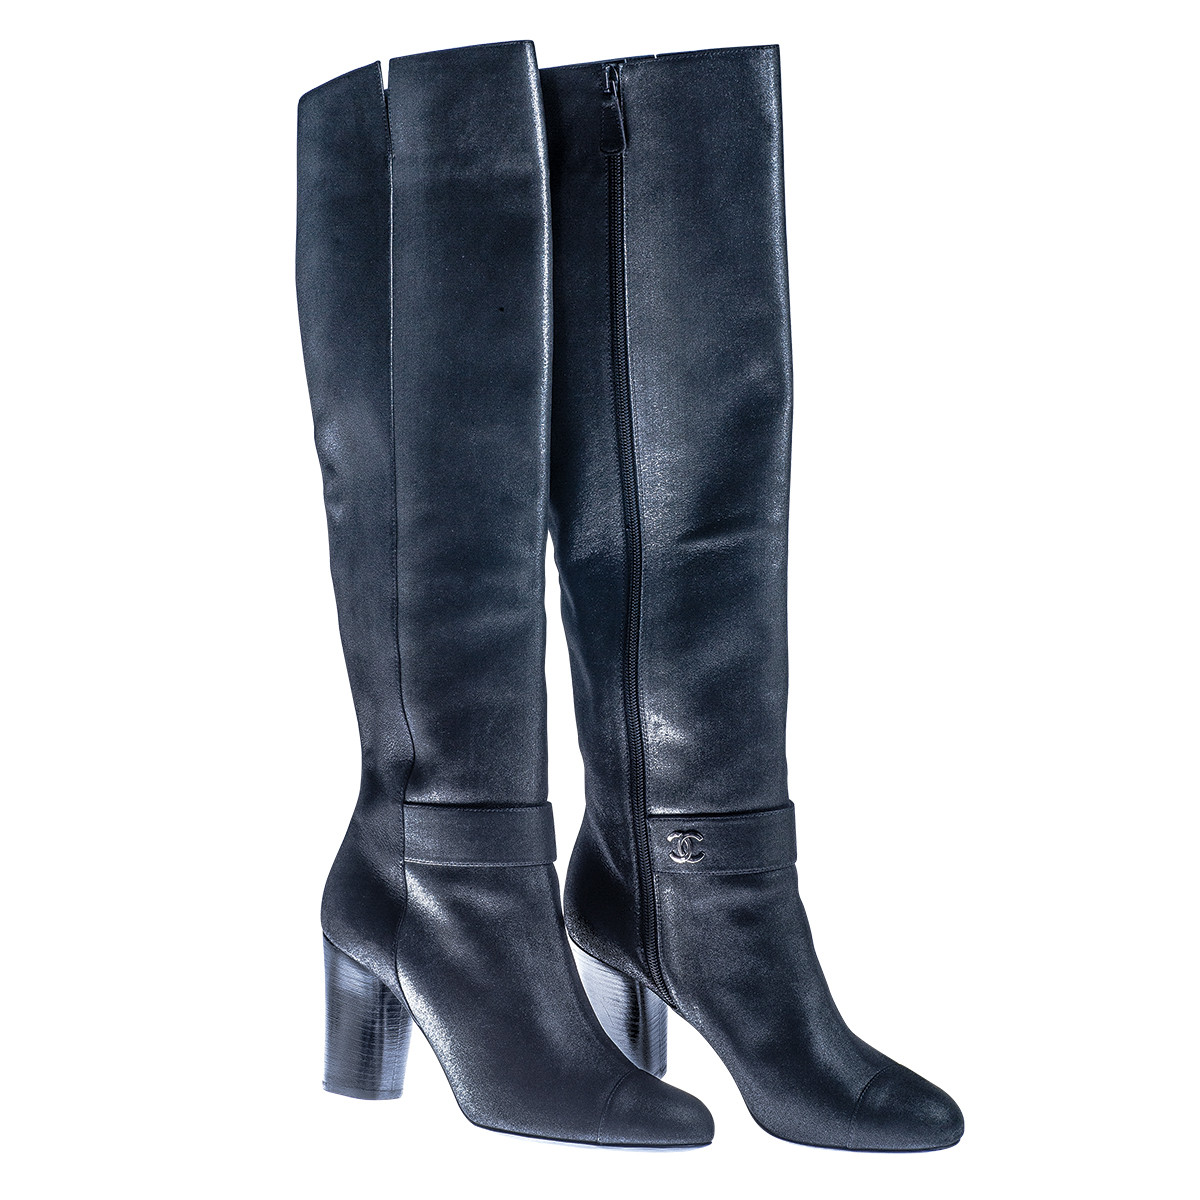 Vintage Chanel Black Boots